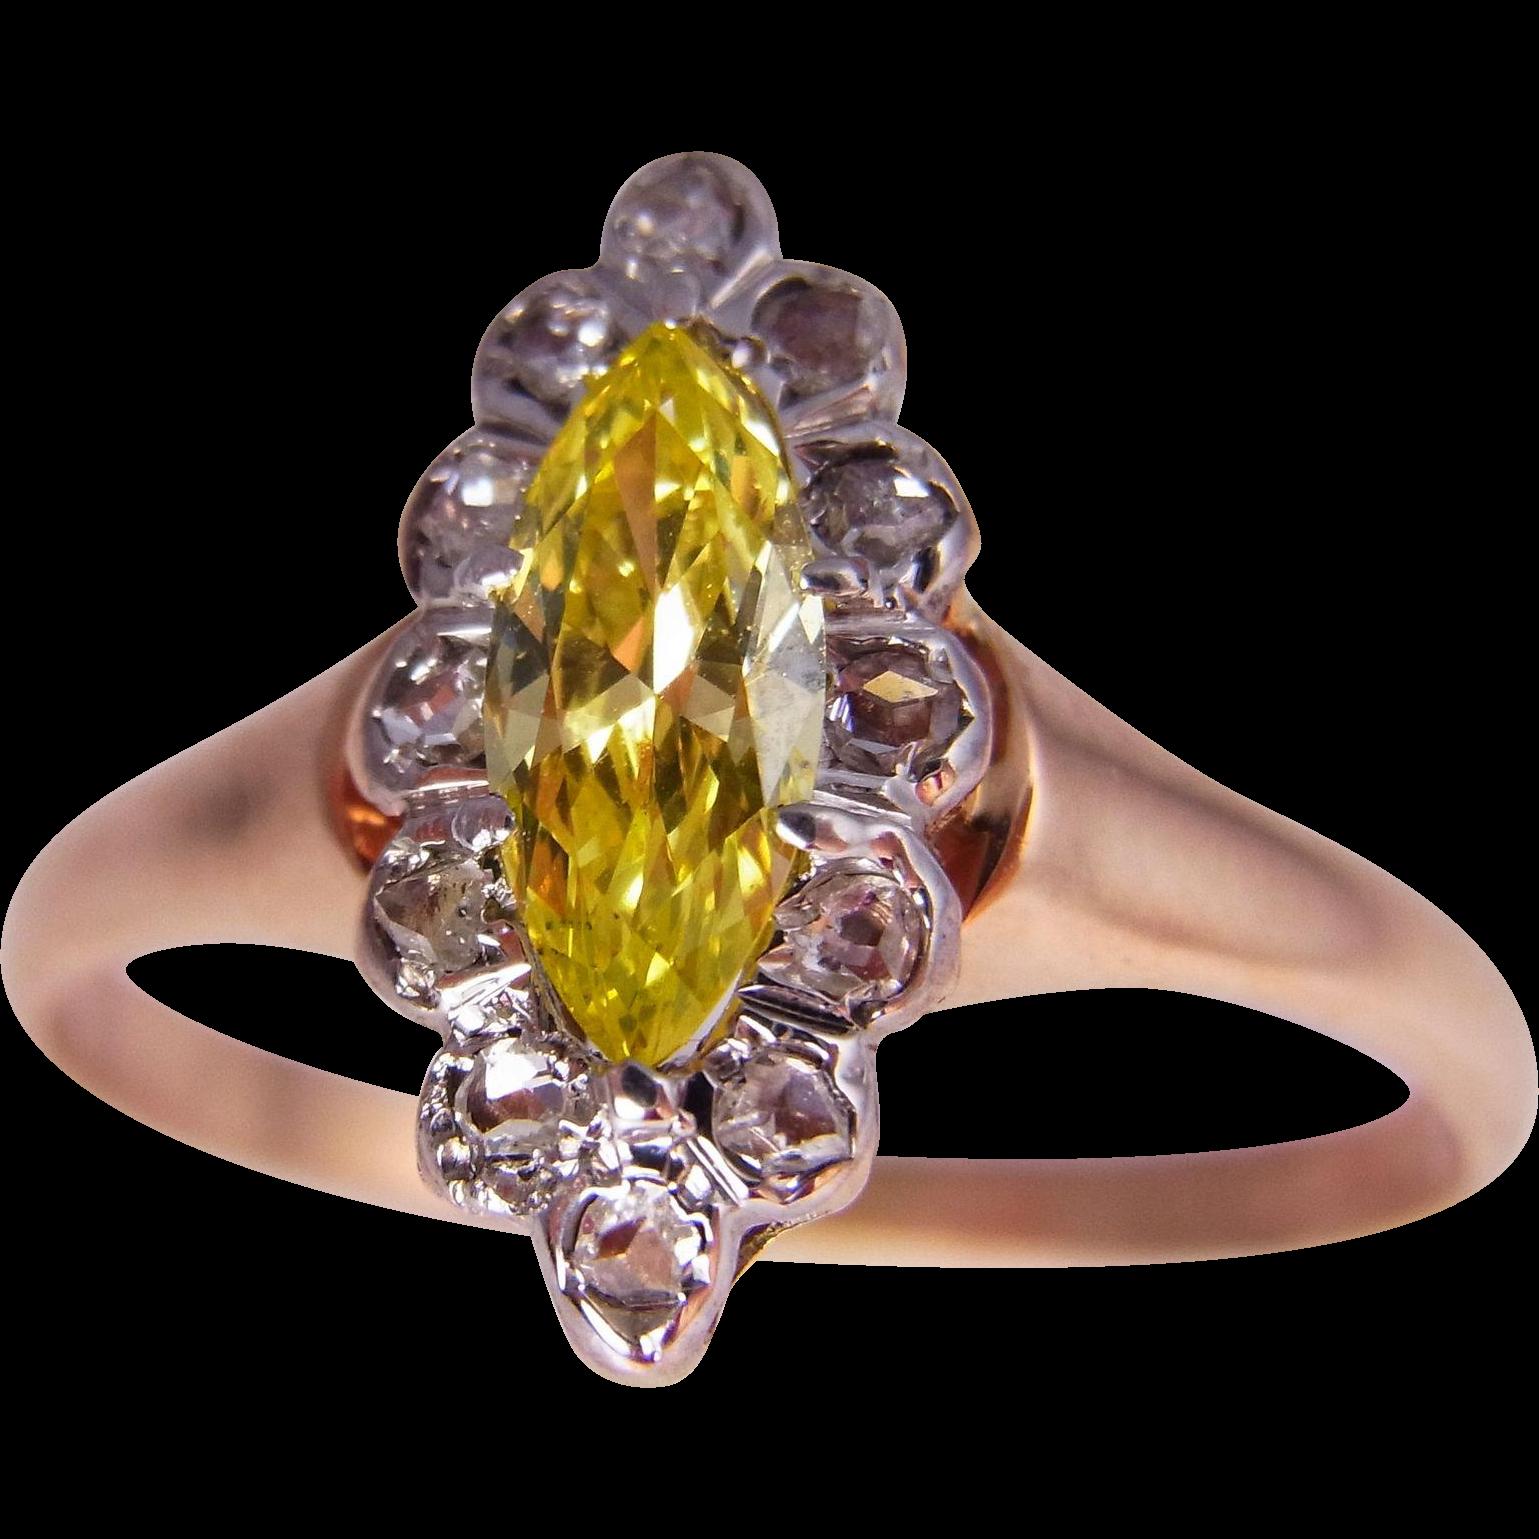 Late Georgian Early Victorian Canary Diamond Engagement Ring Yellow Diamond  Engagement Ring Rose Cut Diamond Engagement Ring Antique Engagement Ring ...